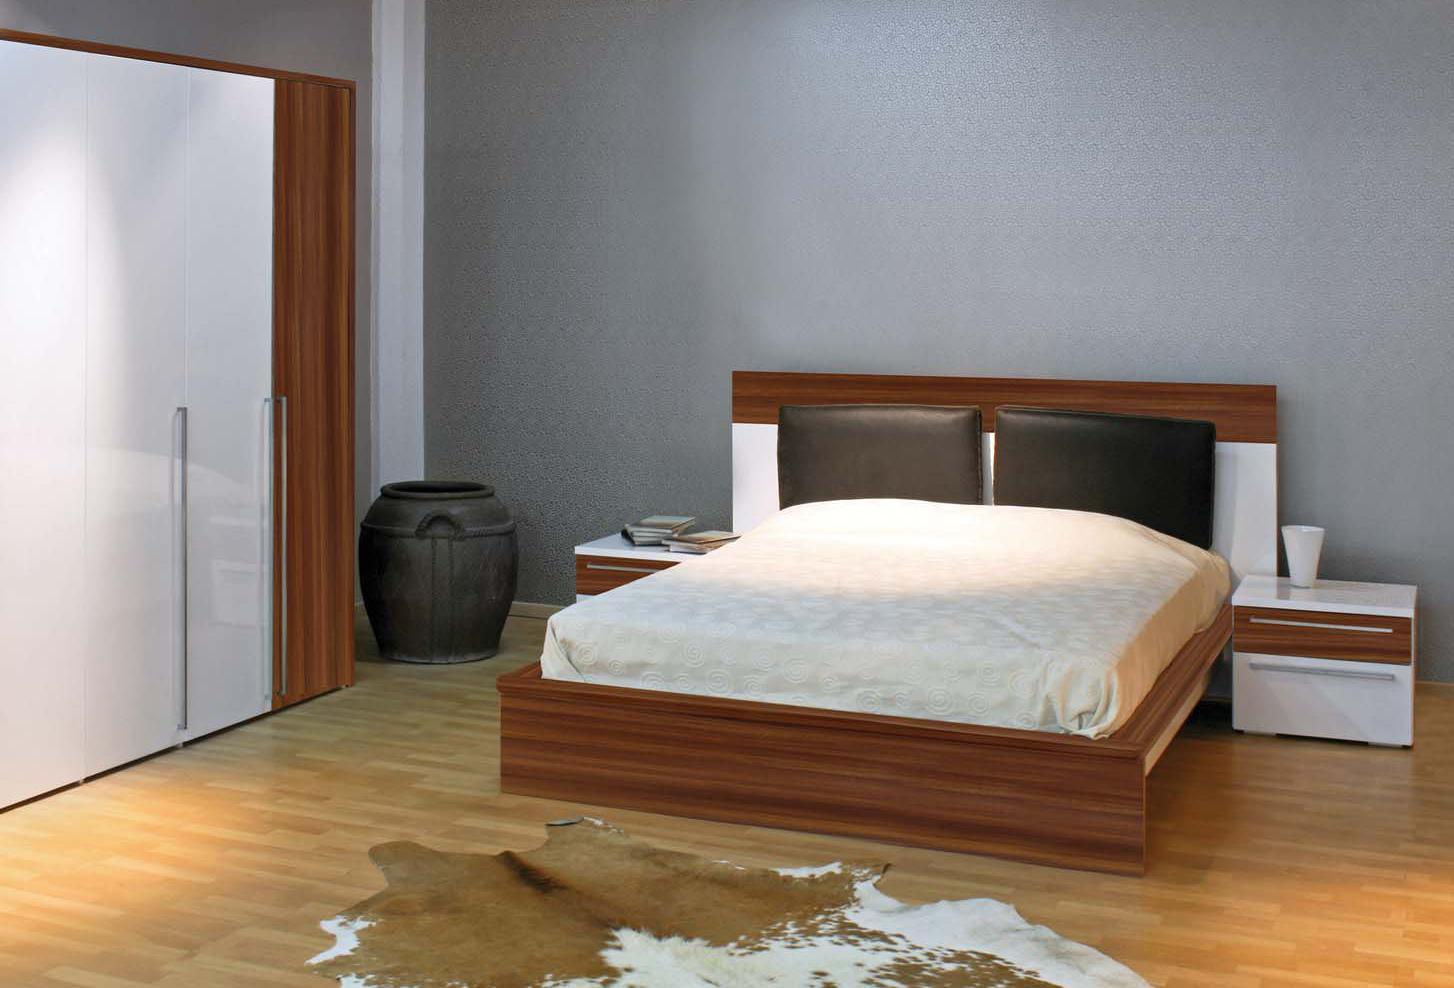 Chambres a coucher dcoration chambre coucher couleur for Petite chambre a coucher design